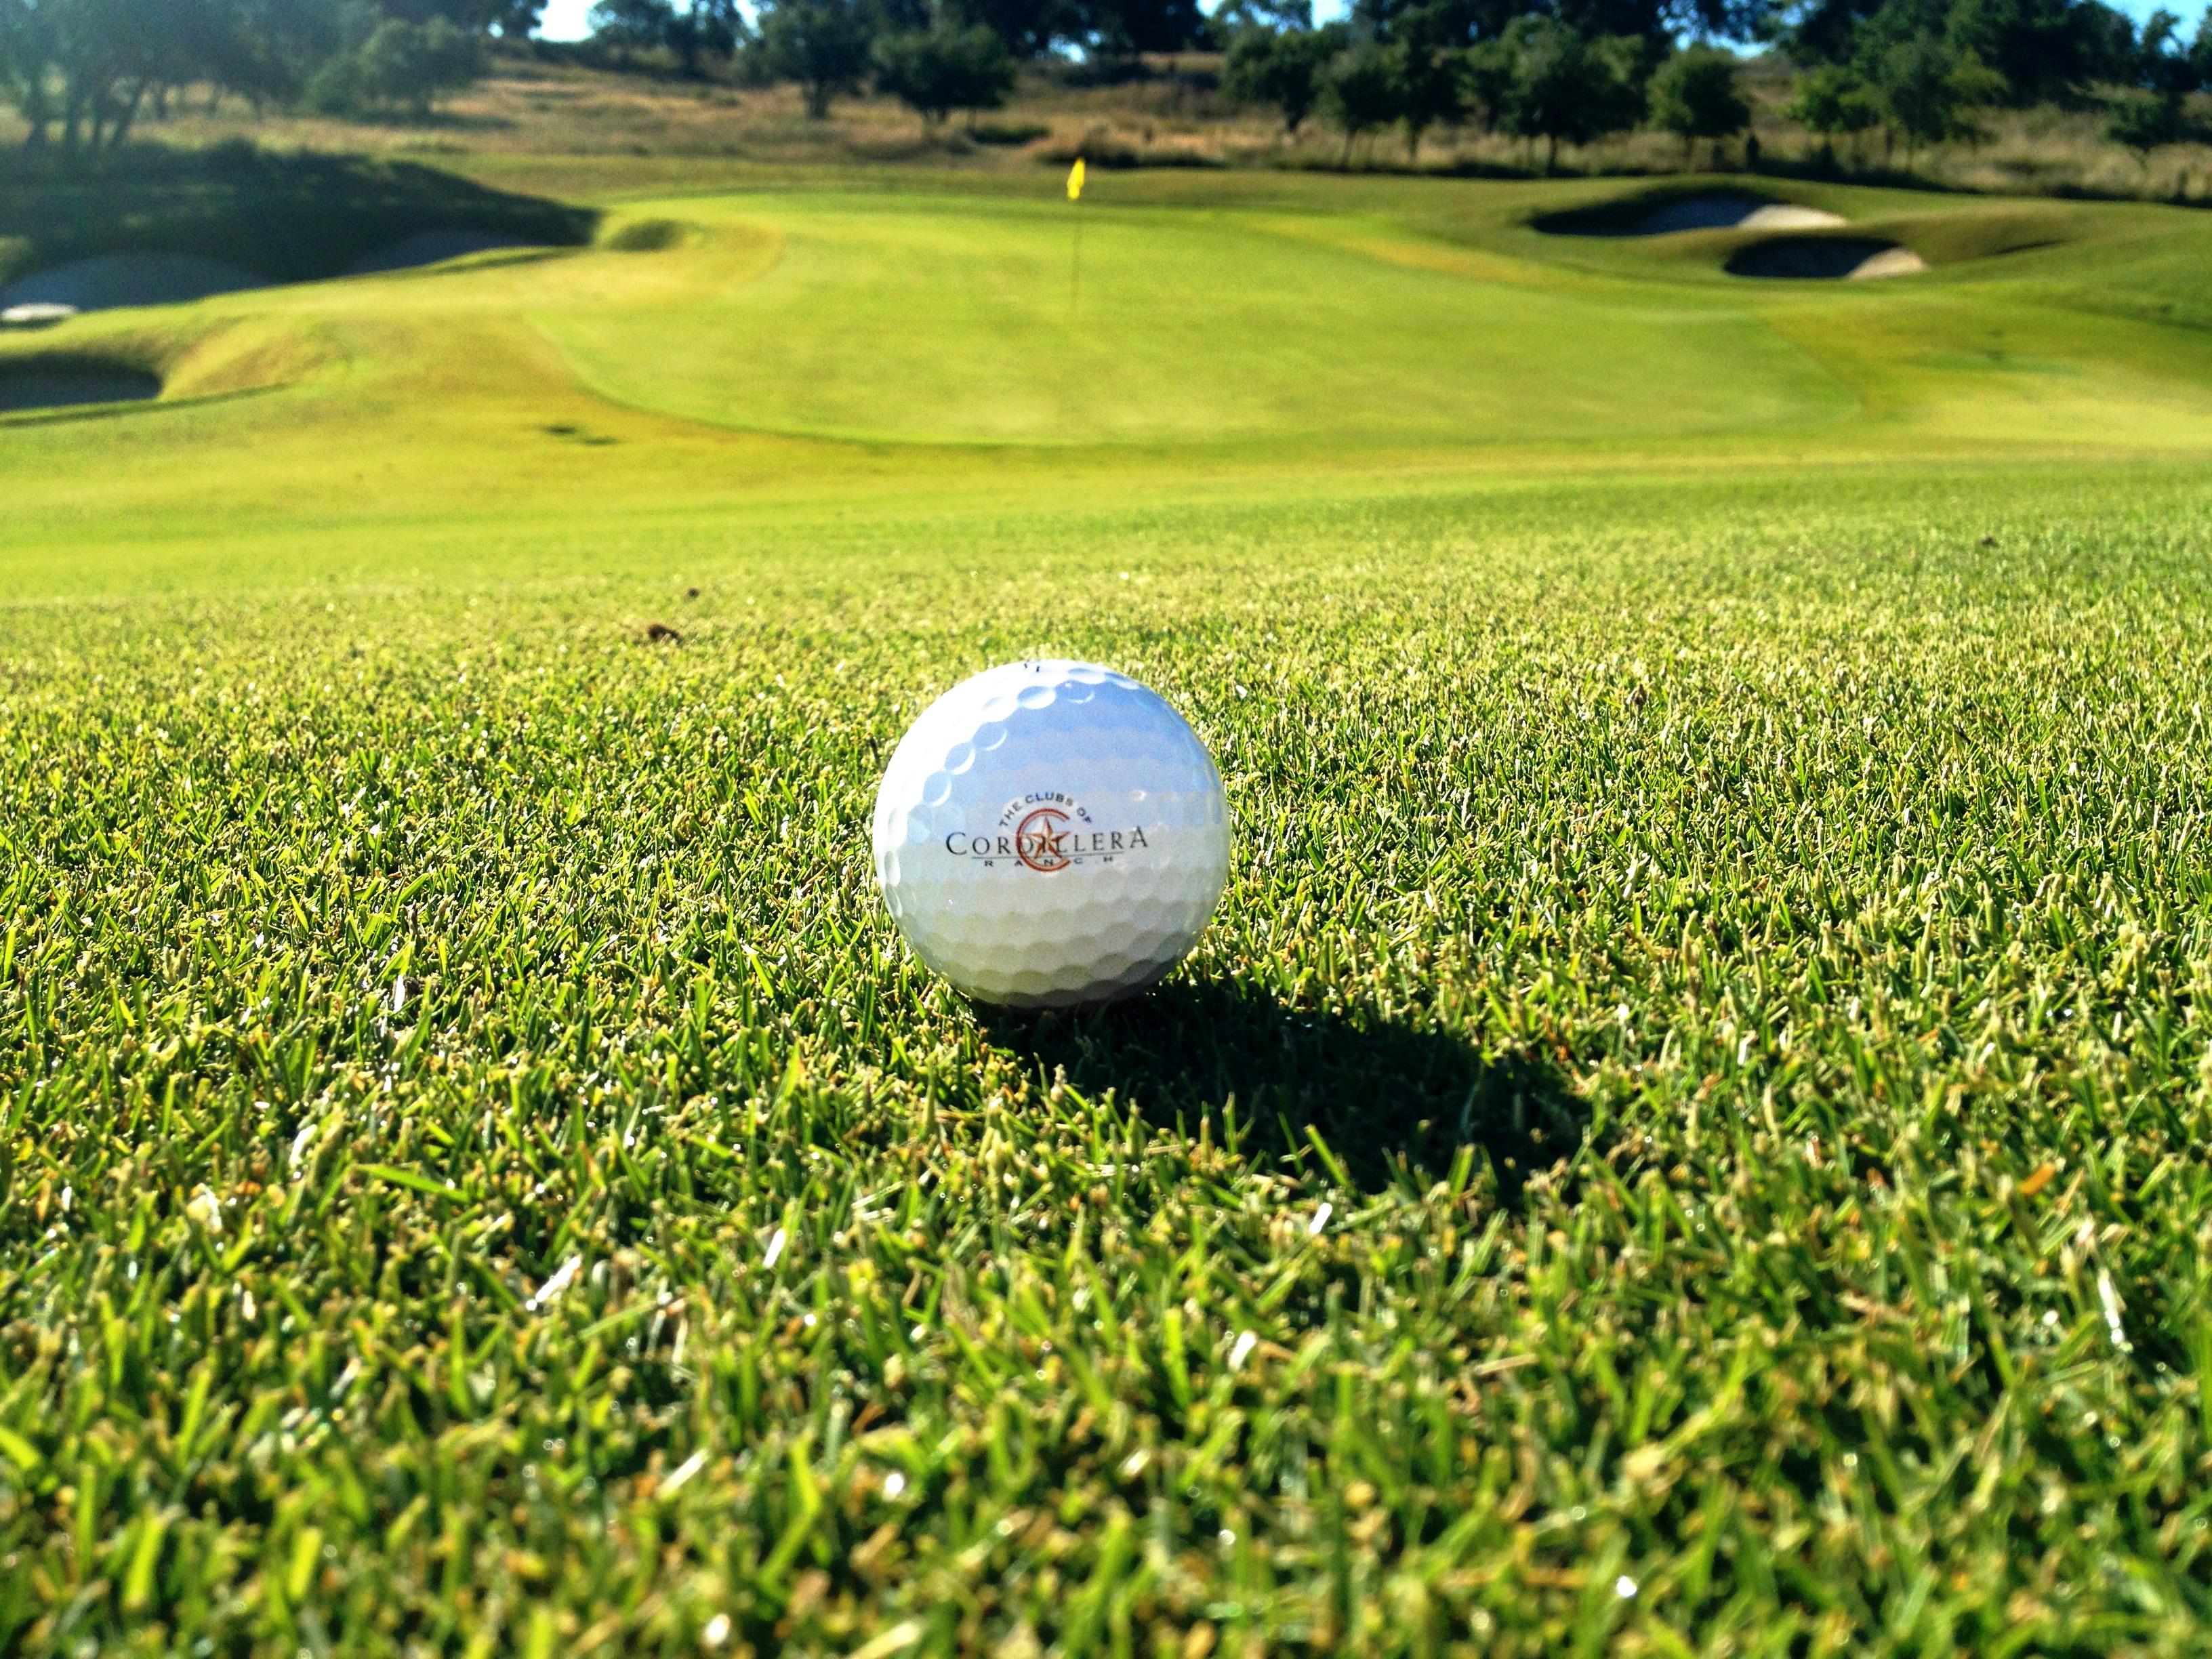 charming golf course grass Part - 5: charming golf course grass images